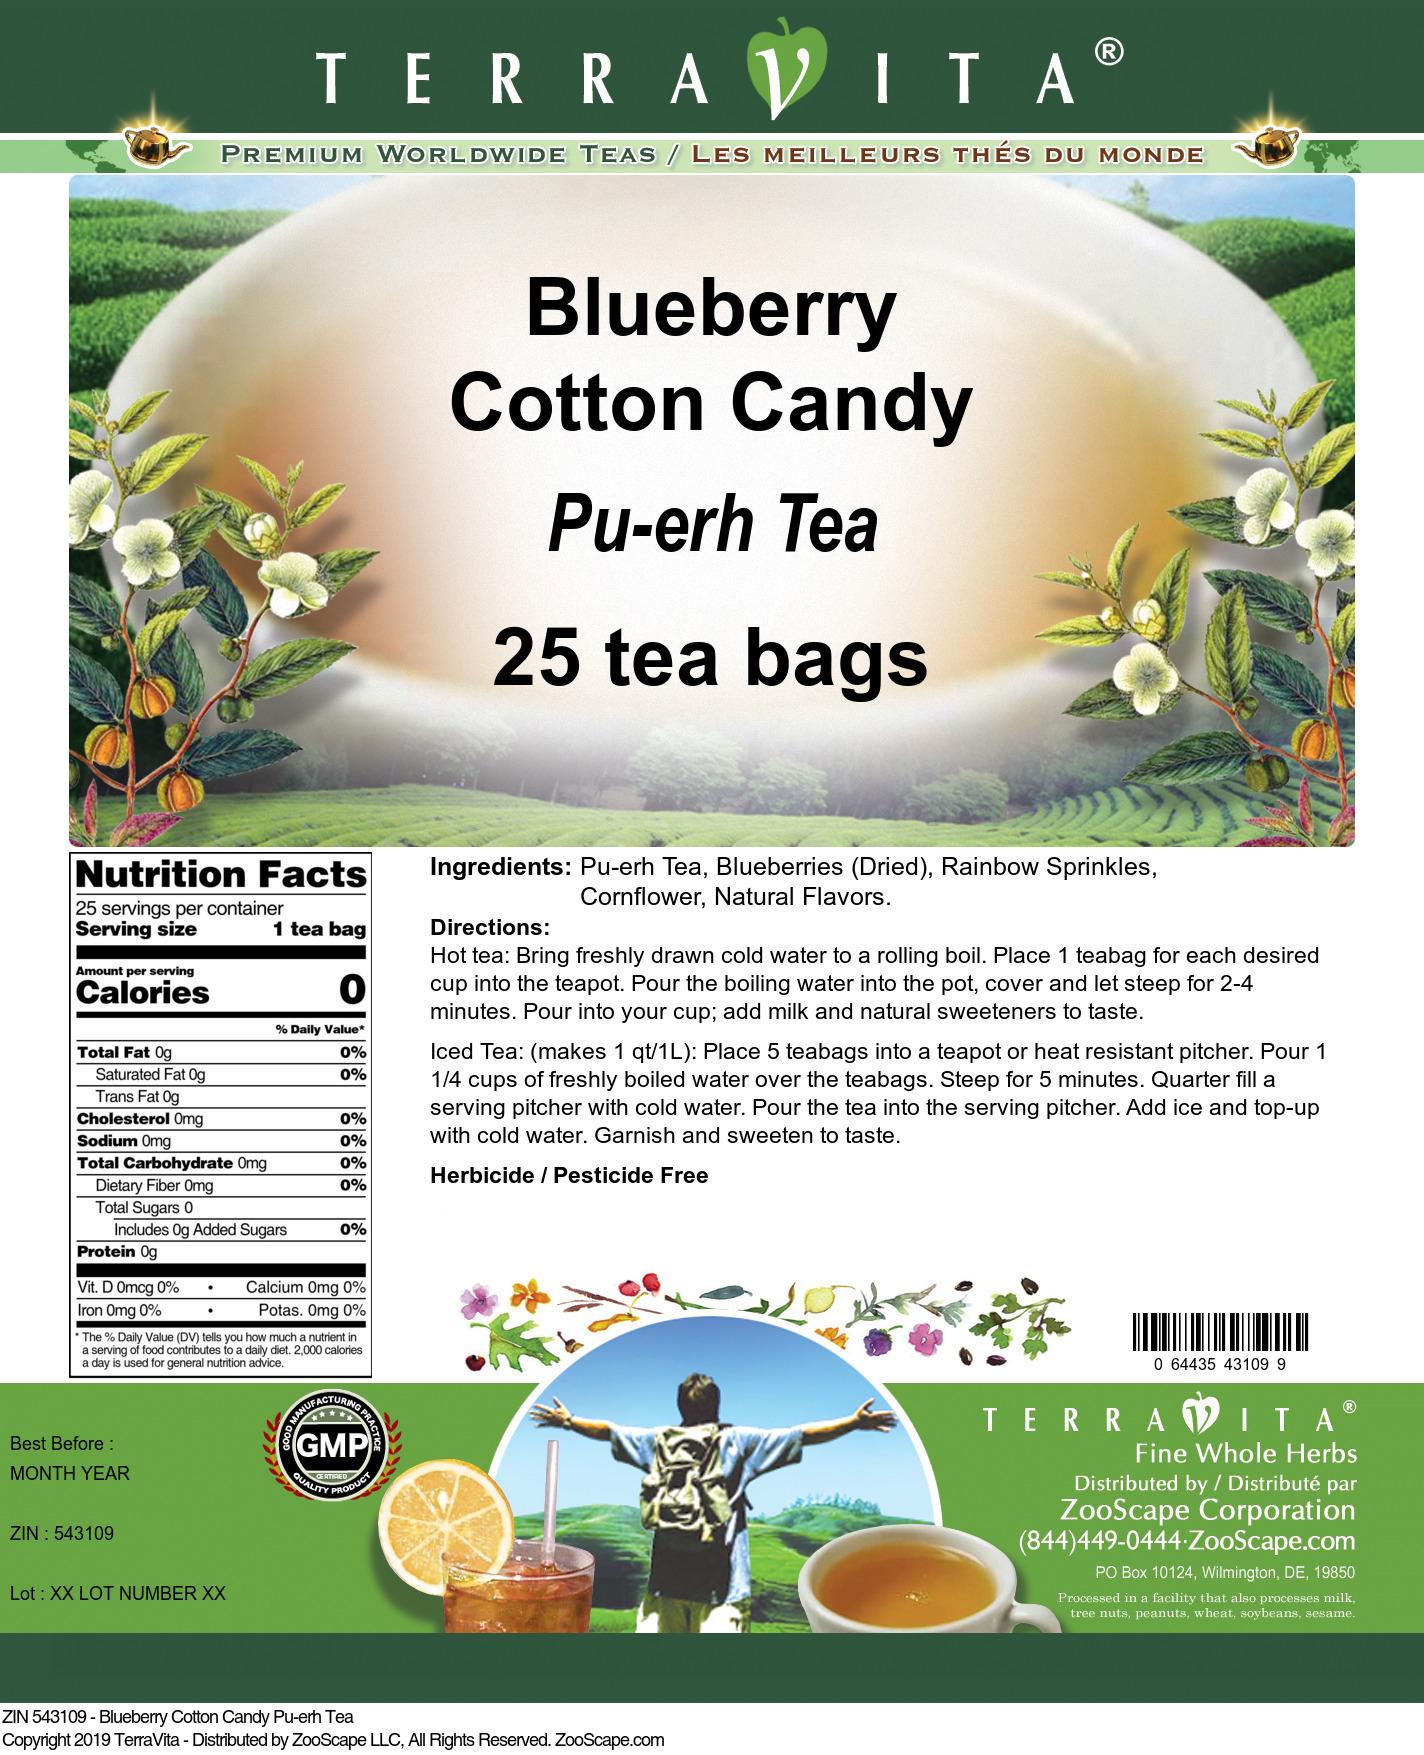 Blueberry Cotton Candy Pu-erh Tea